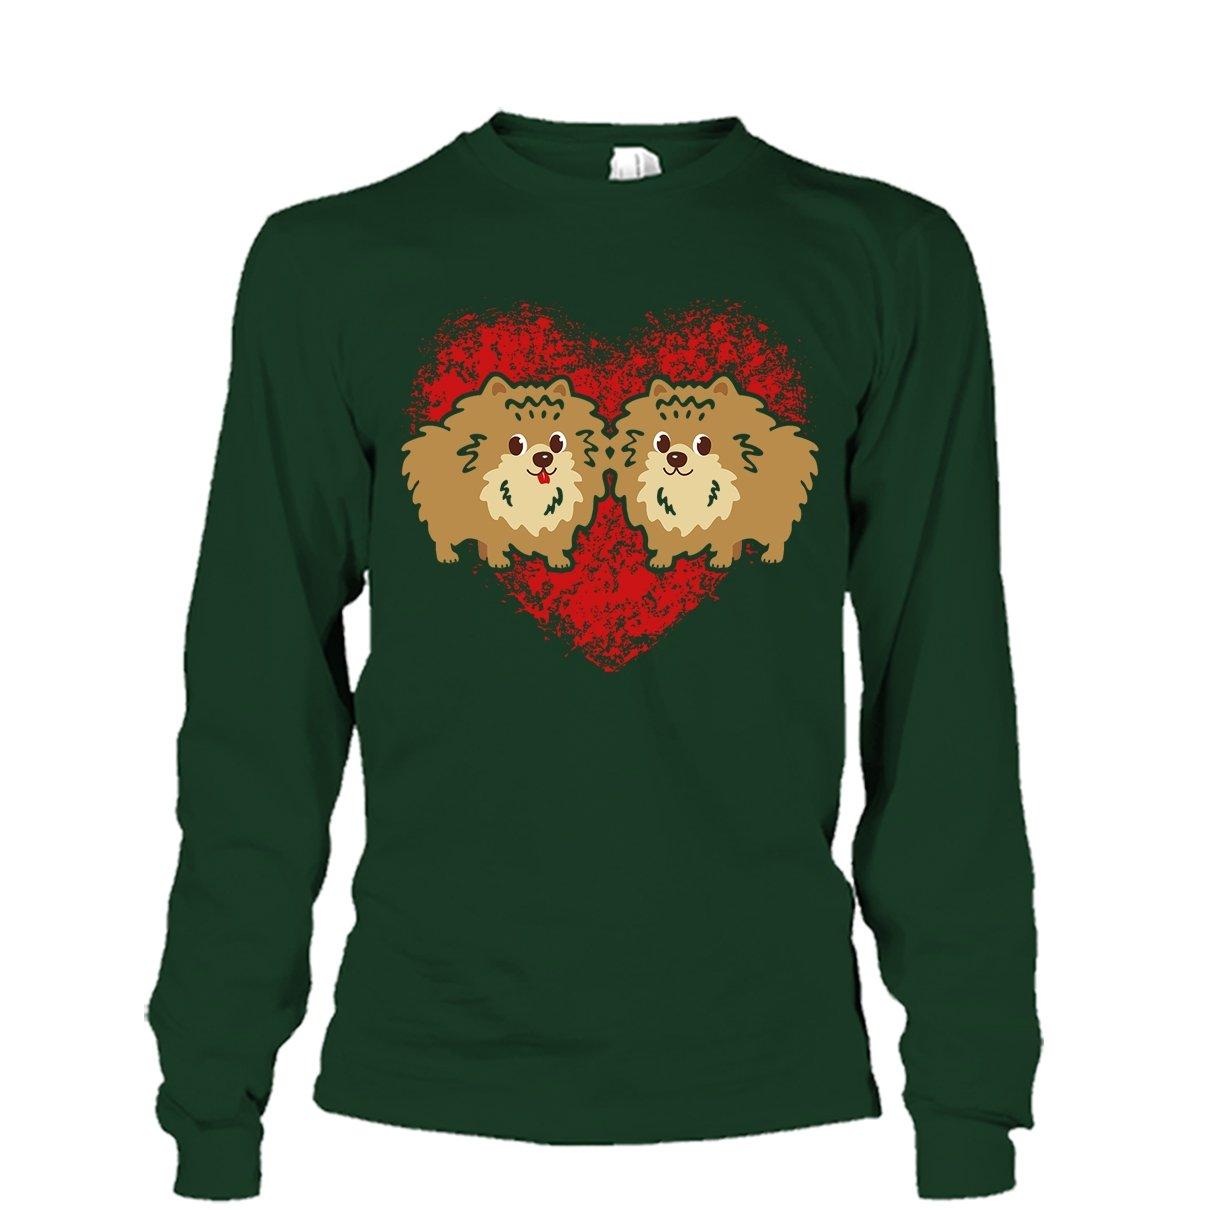 Mazoli Pomeranian T Shirts Design Cool I Love My Pomeranian Tee Shirt Best Gift for Someone Special